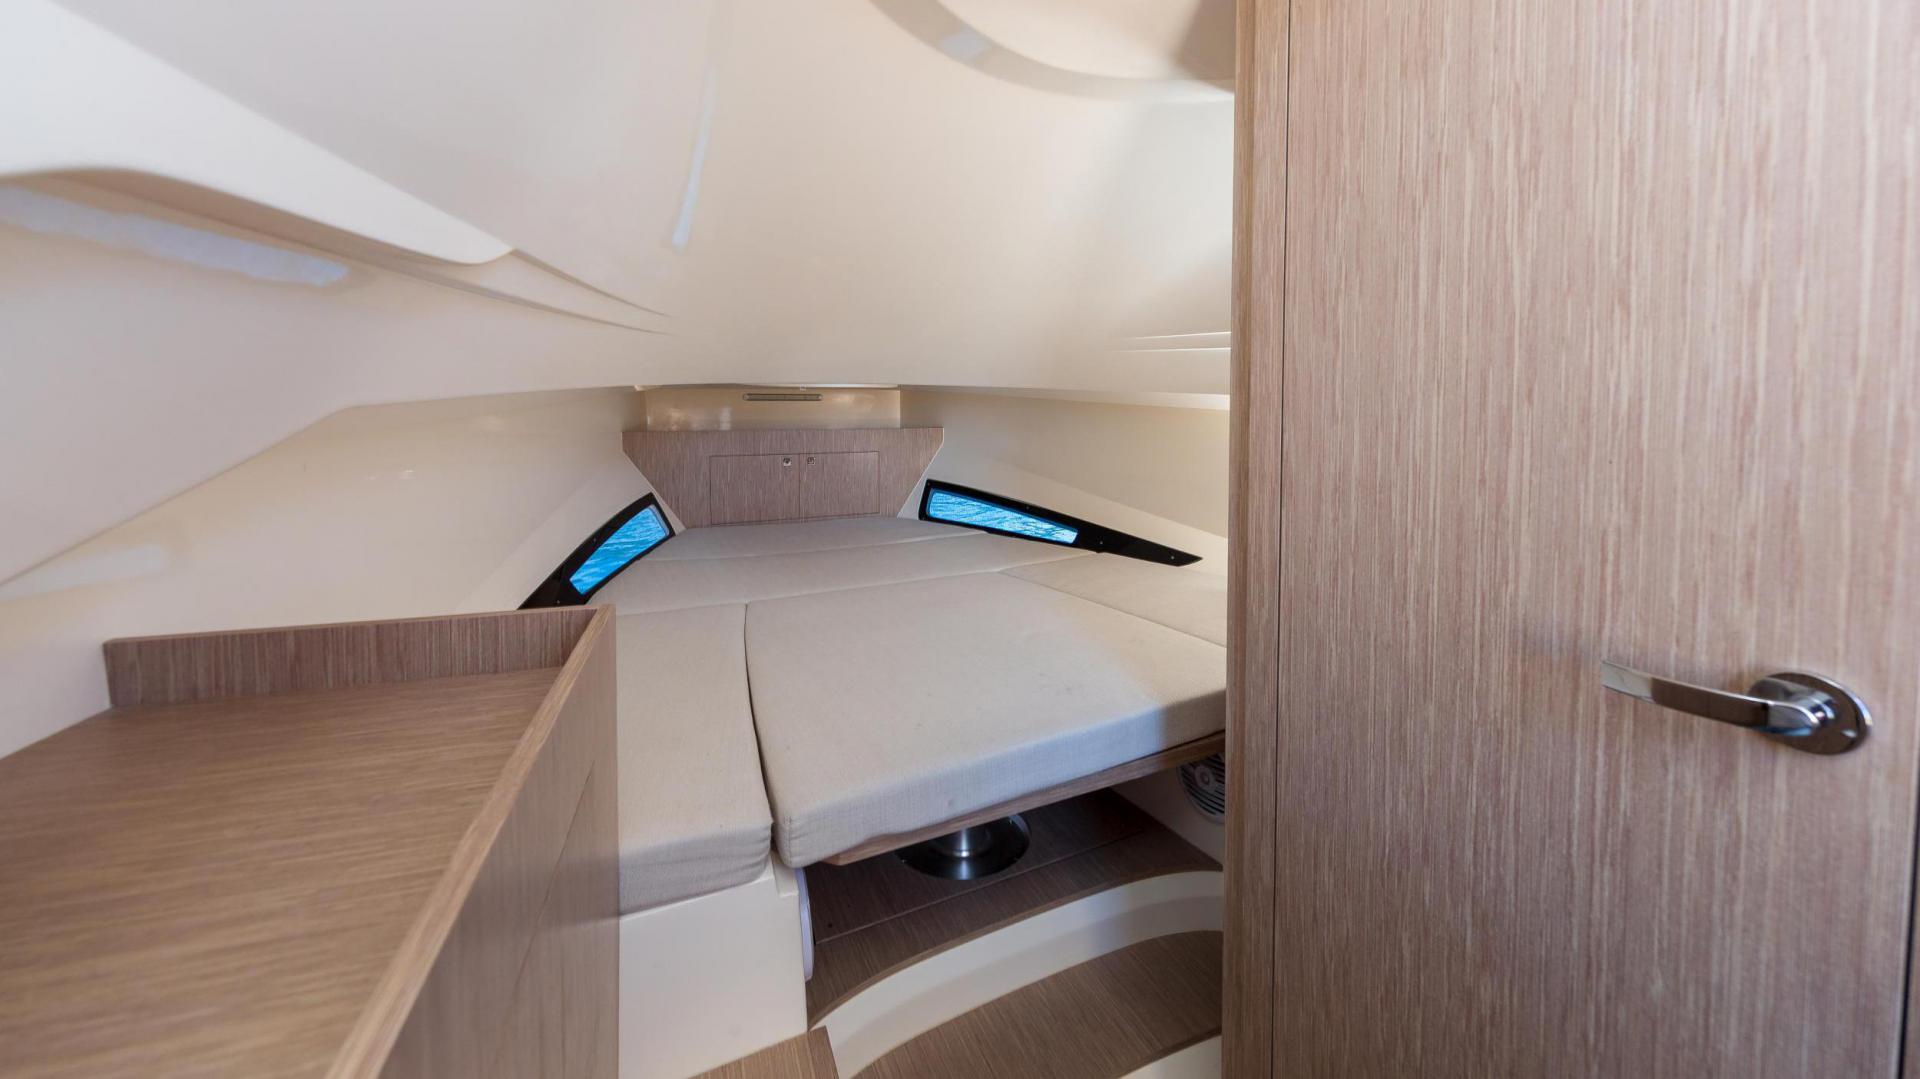 Prince 38 sport cabin - image 5